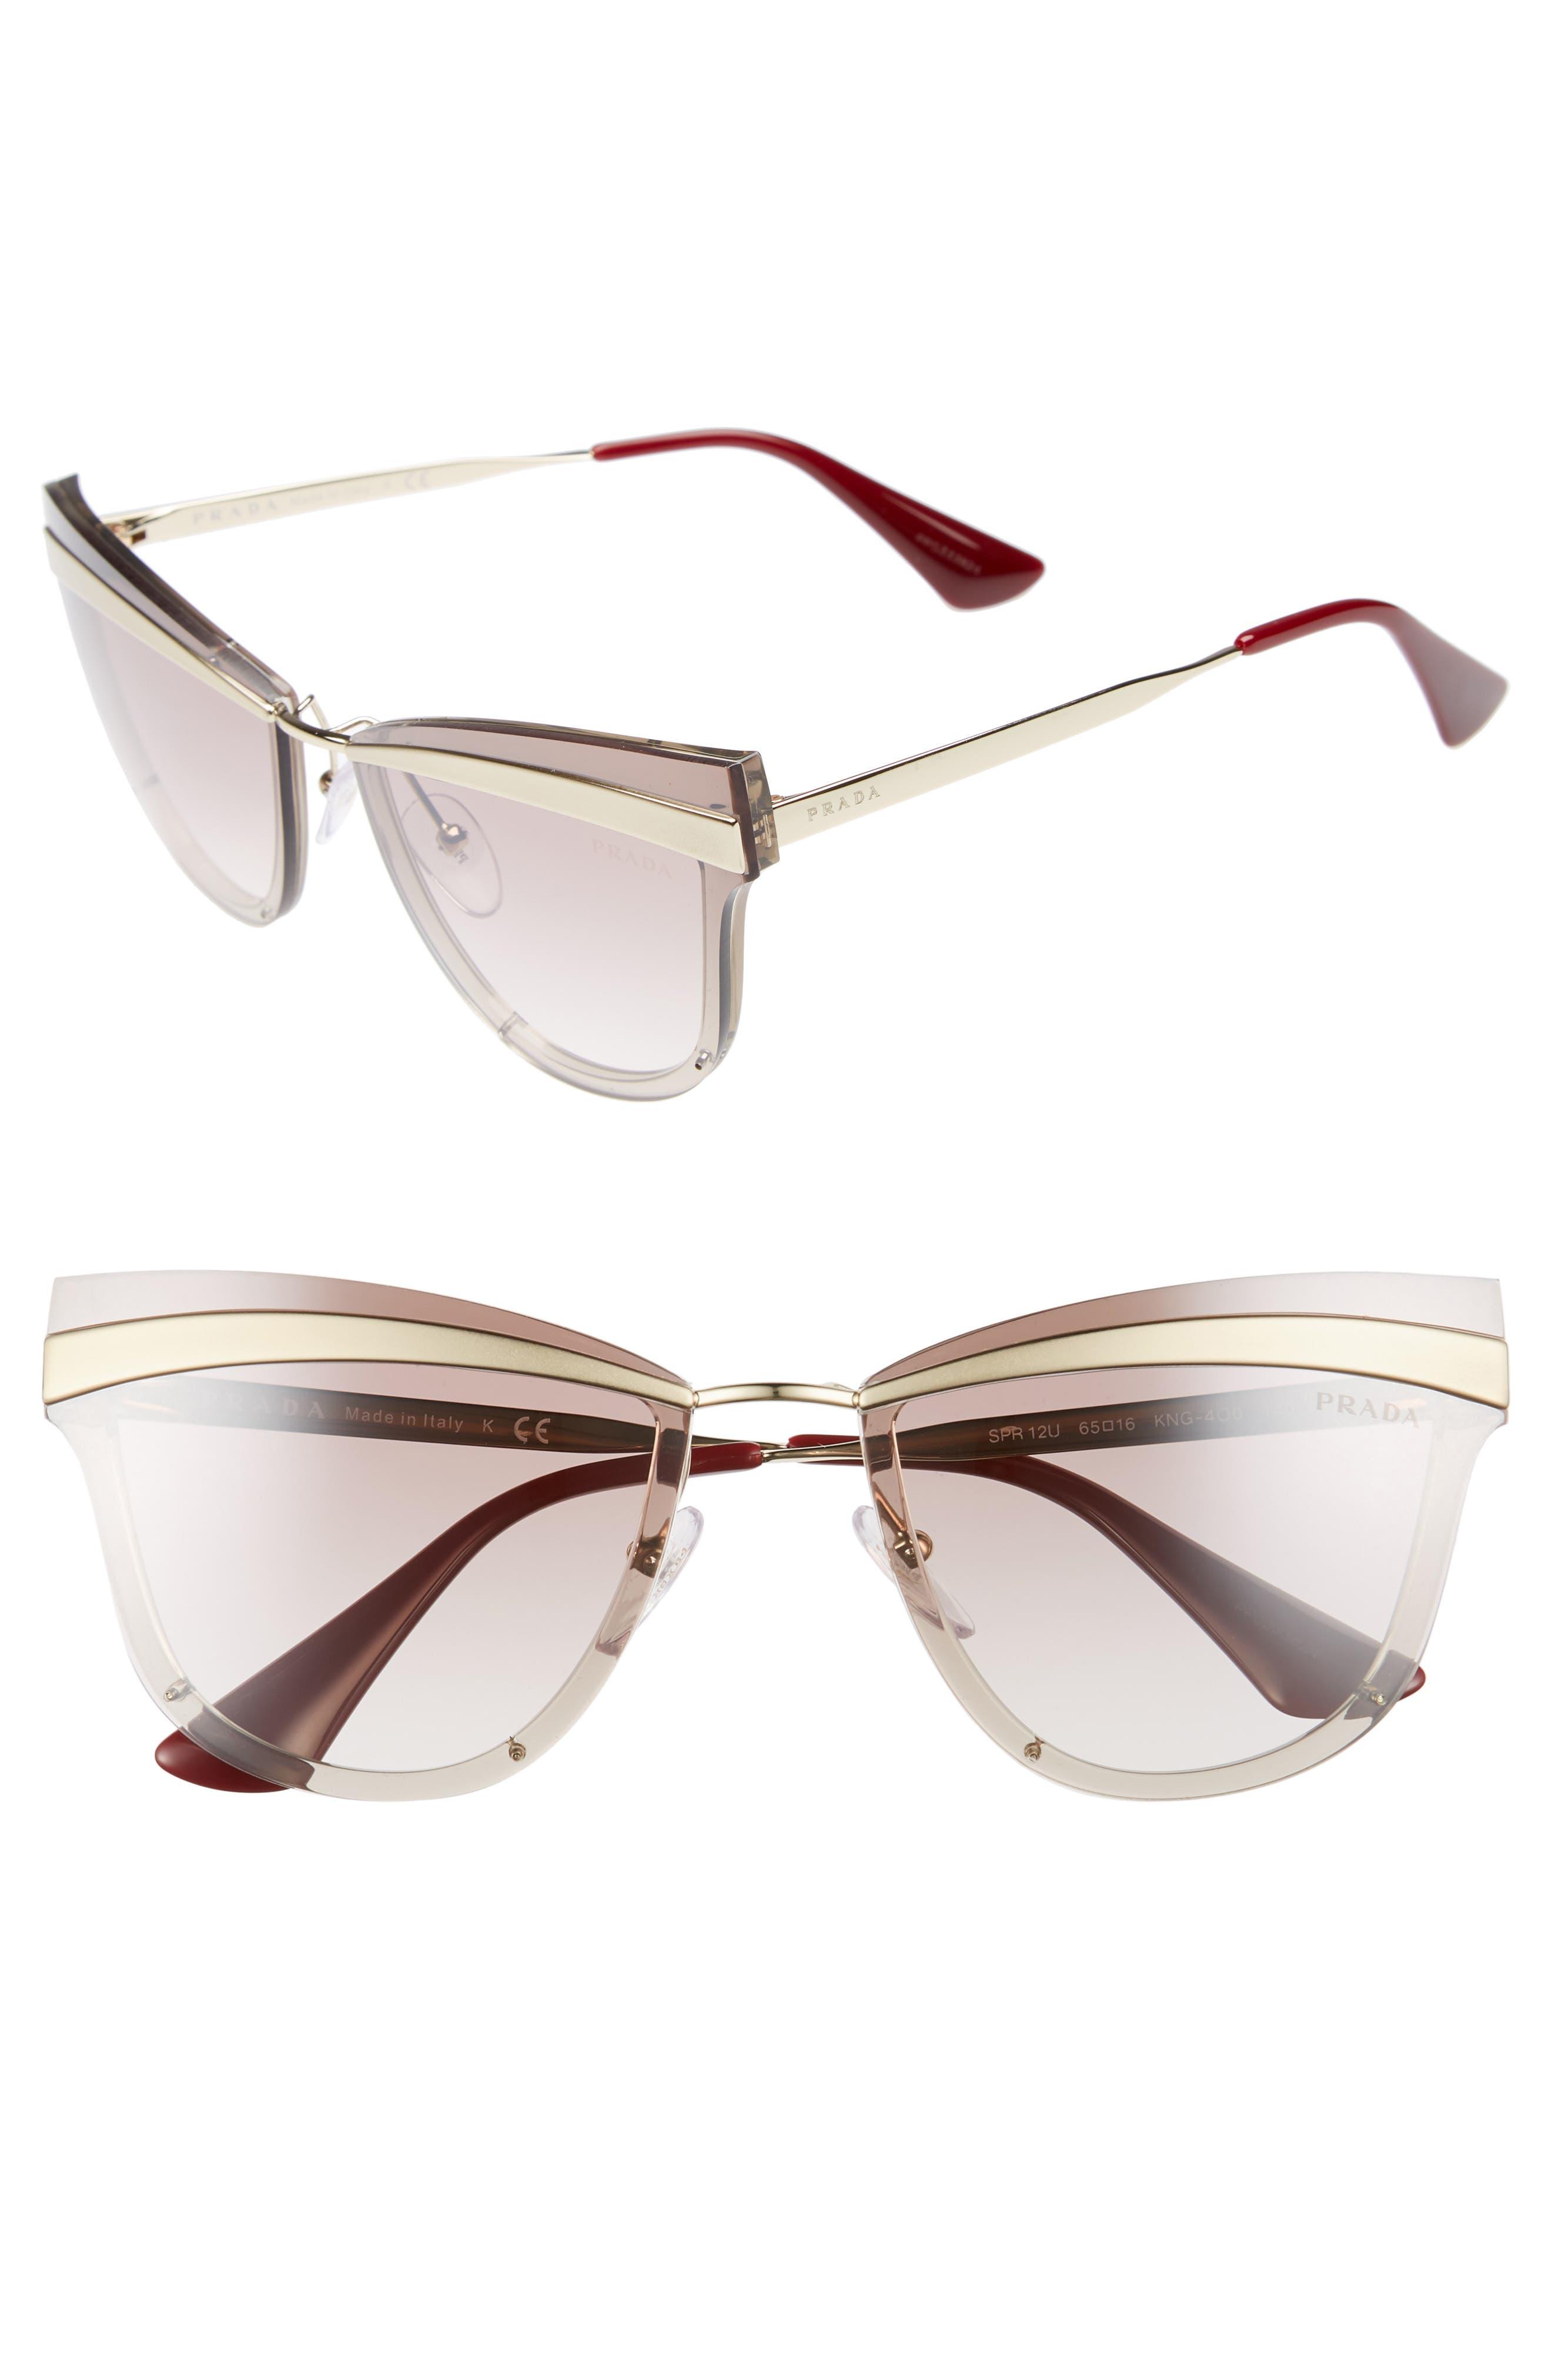 Main Image - Prada Cinema Evolution 65mm Cat Eye Sunglasses